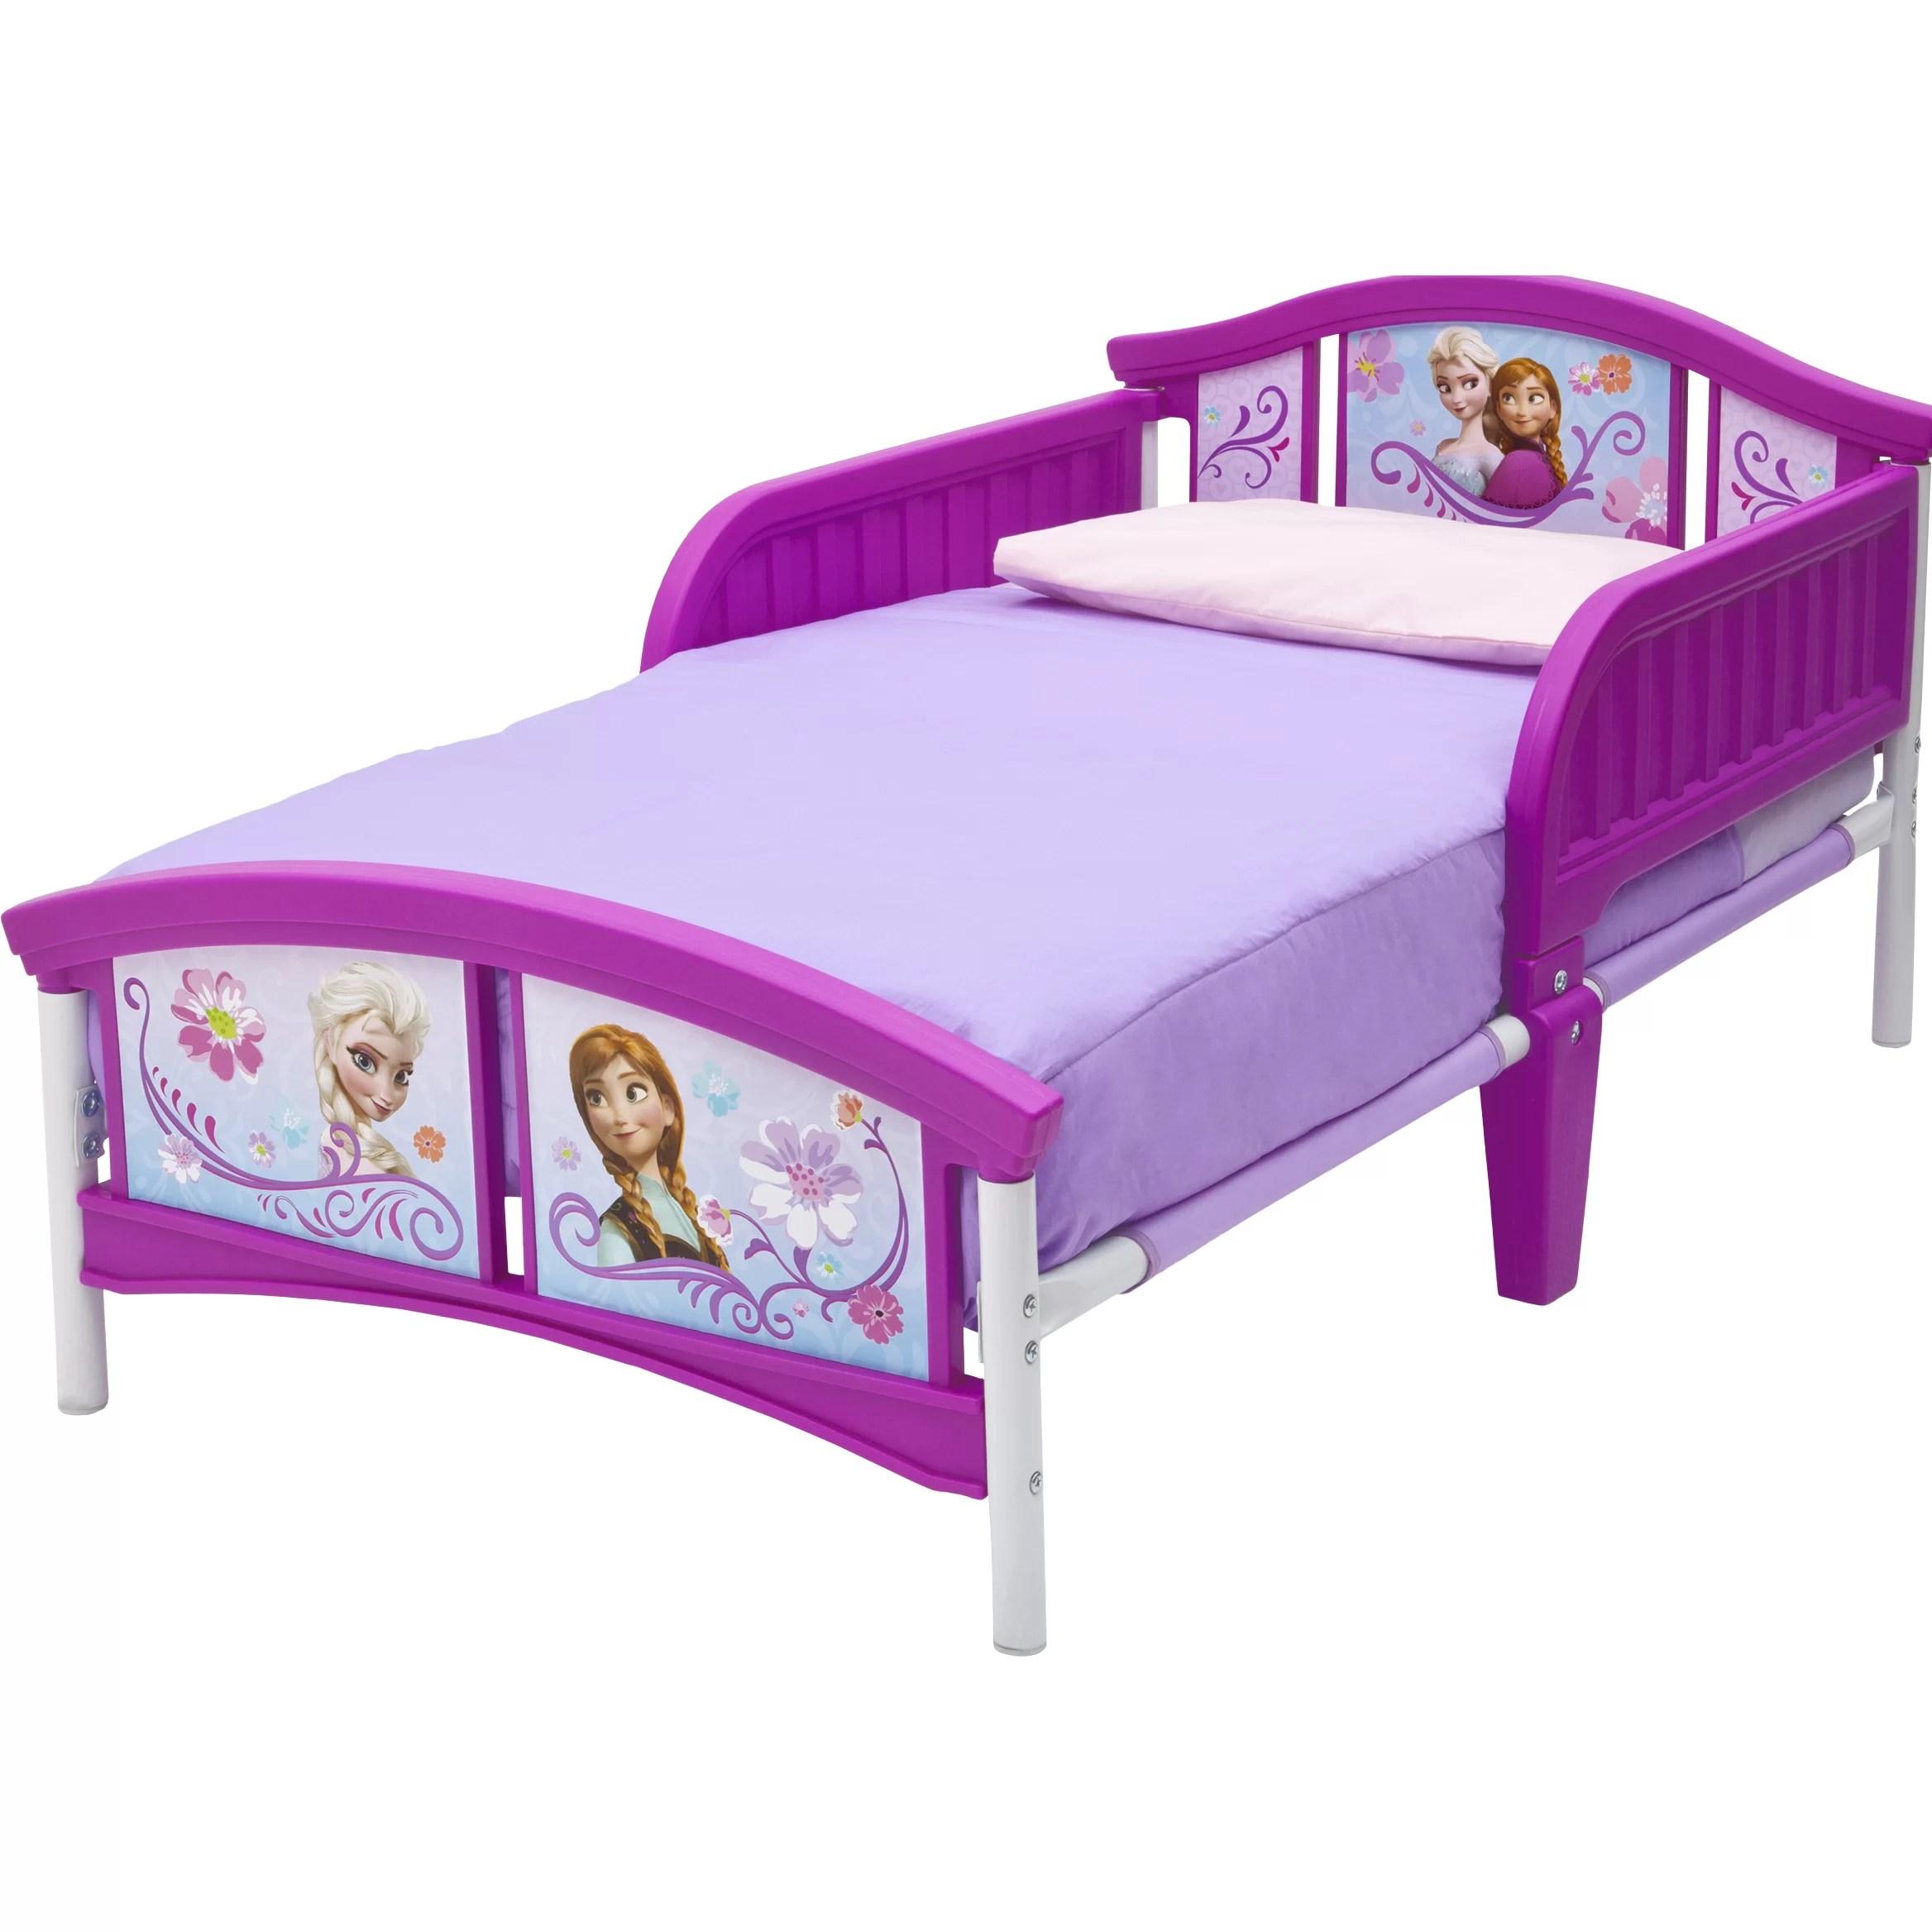 Frozen Beds Delta Children Disney Frozen Toddler Bed Reviews